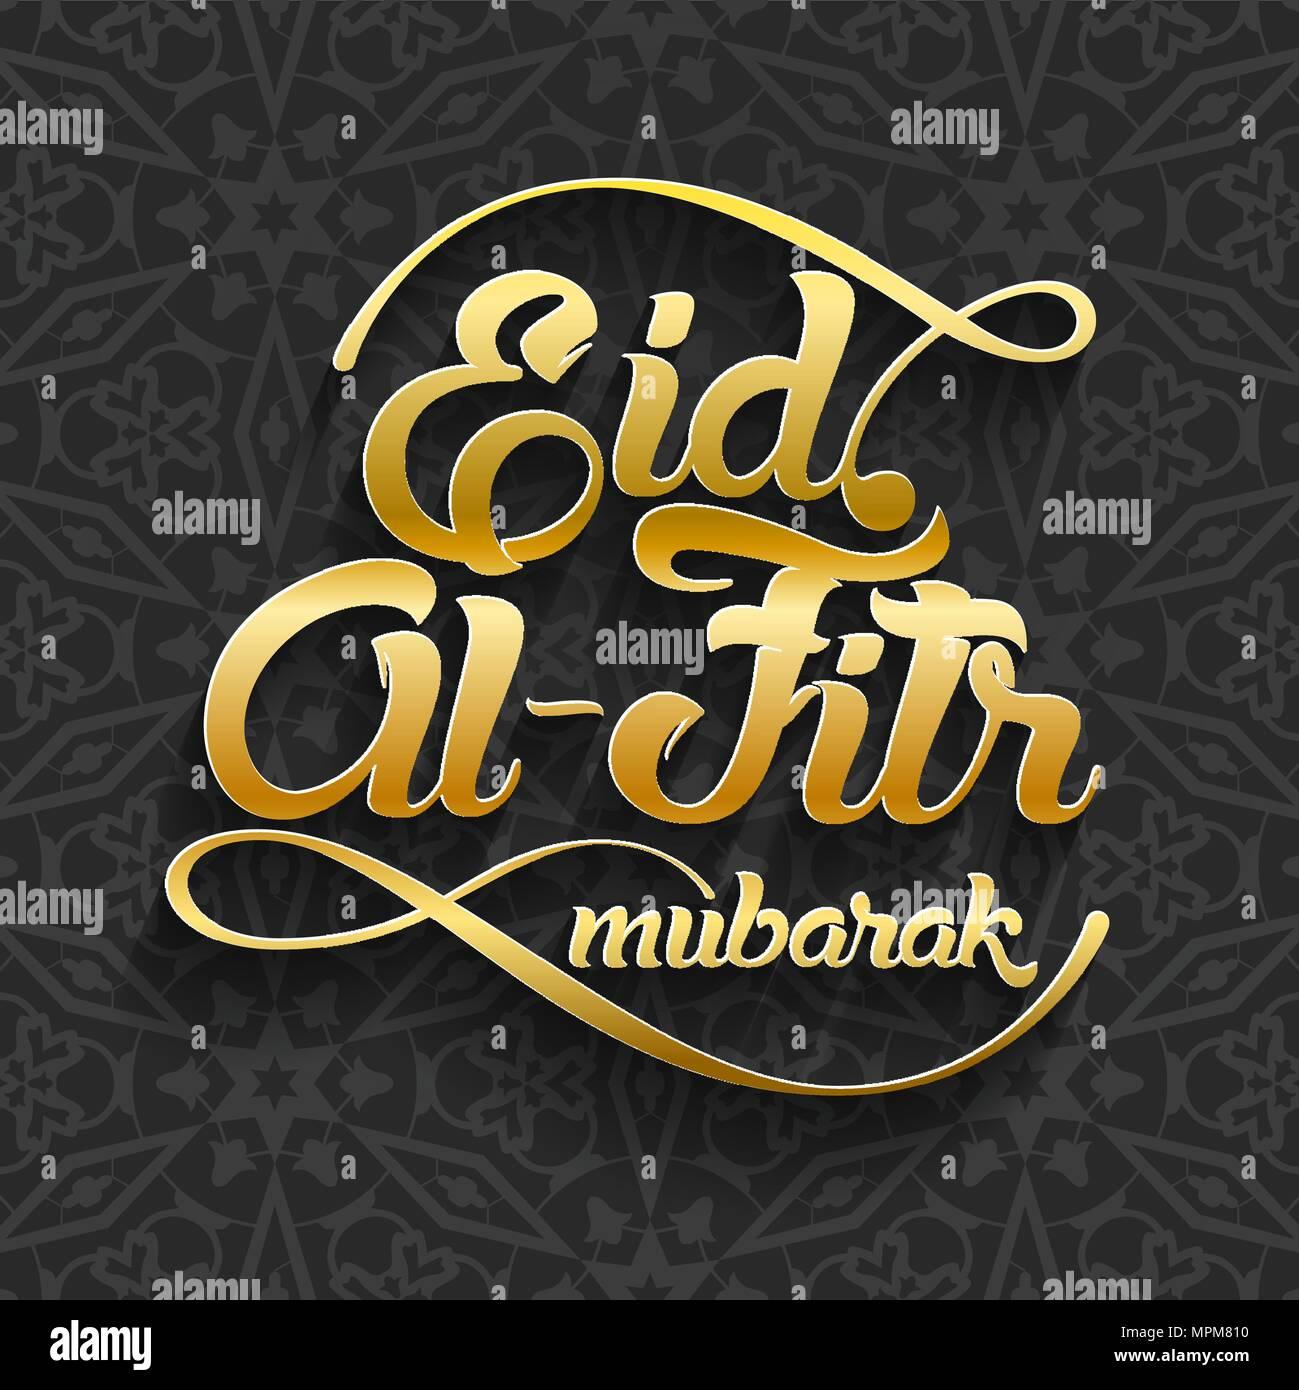 Eid al fitr mubarak greeting card vector illustration welcoming eid al fitr mubarak greeting card vector illustration welcoming ramadan m4hsunfo